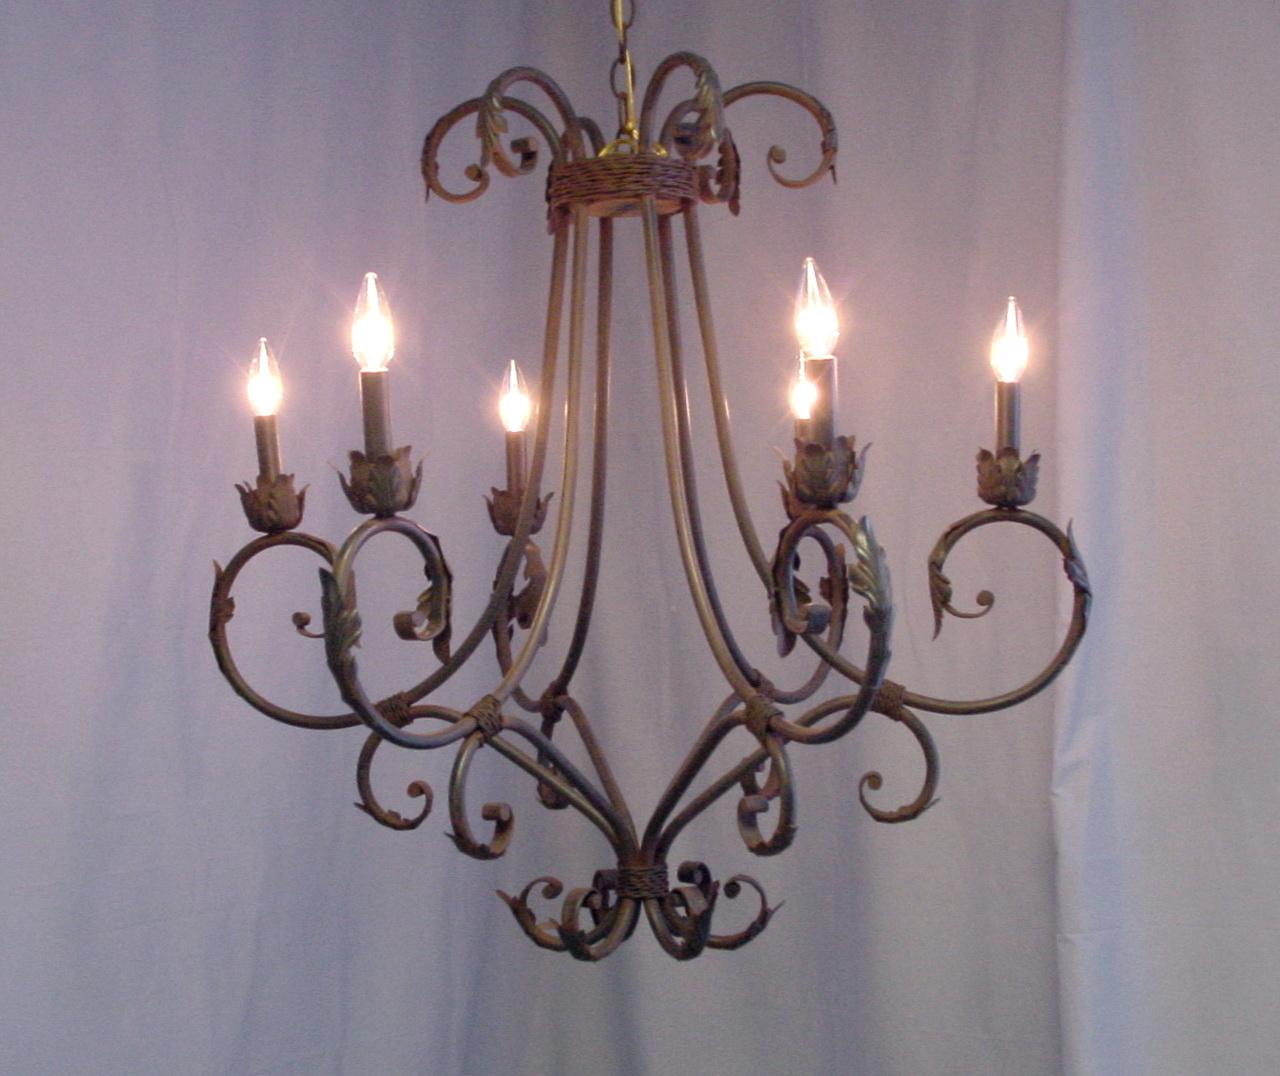 Hampton Bay 6 Light Chandelier